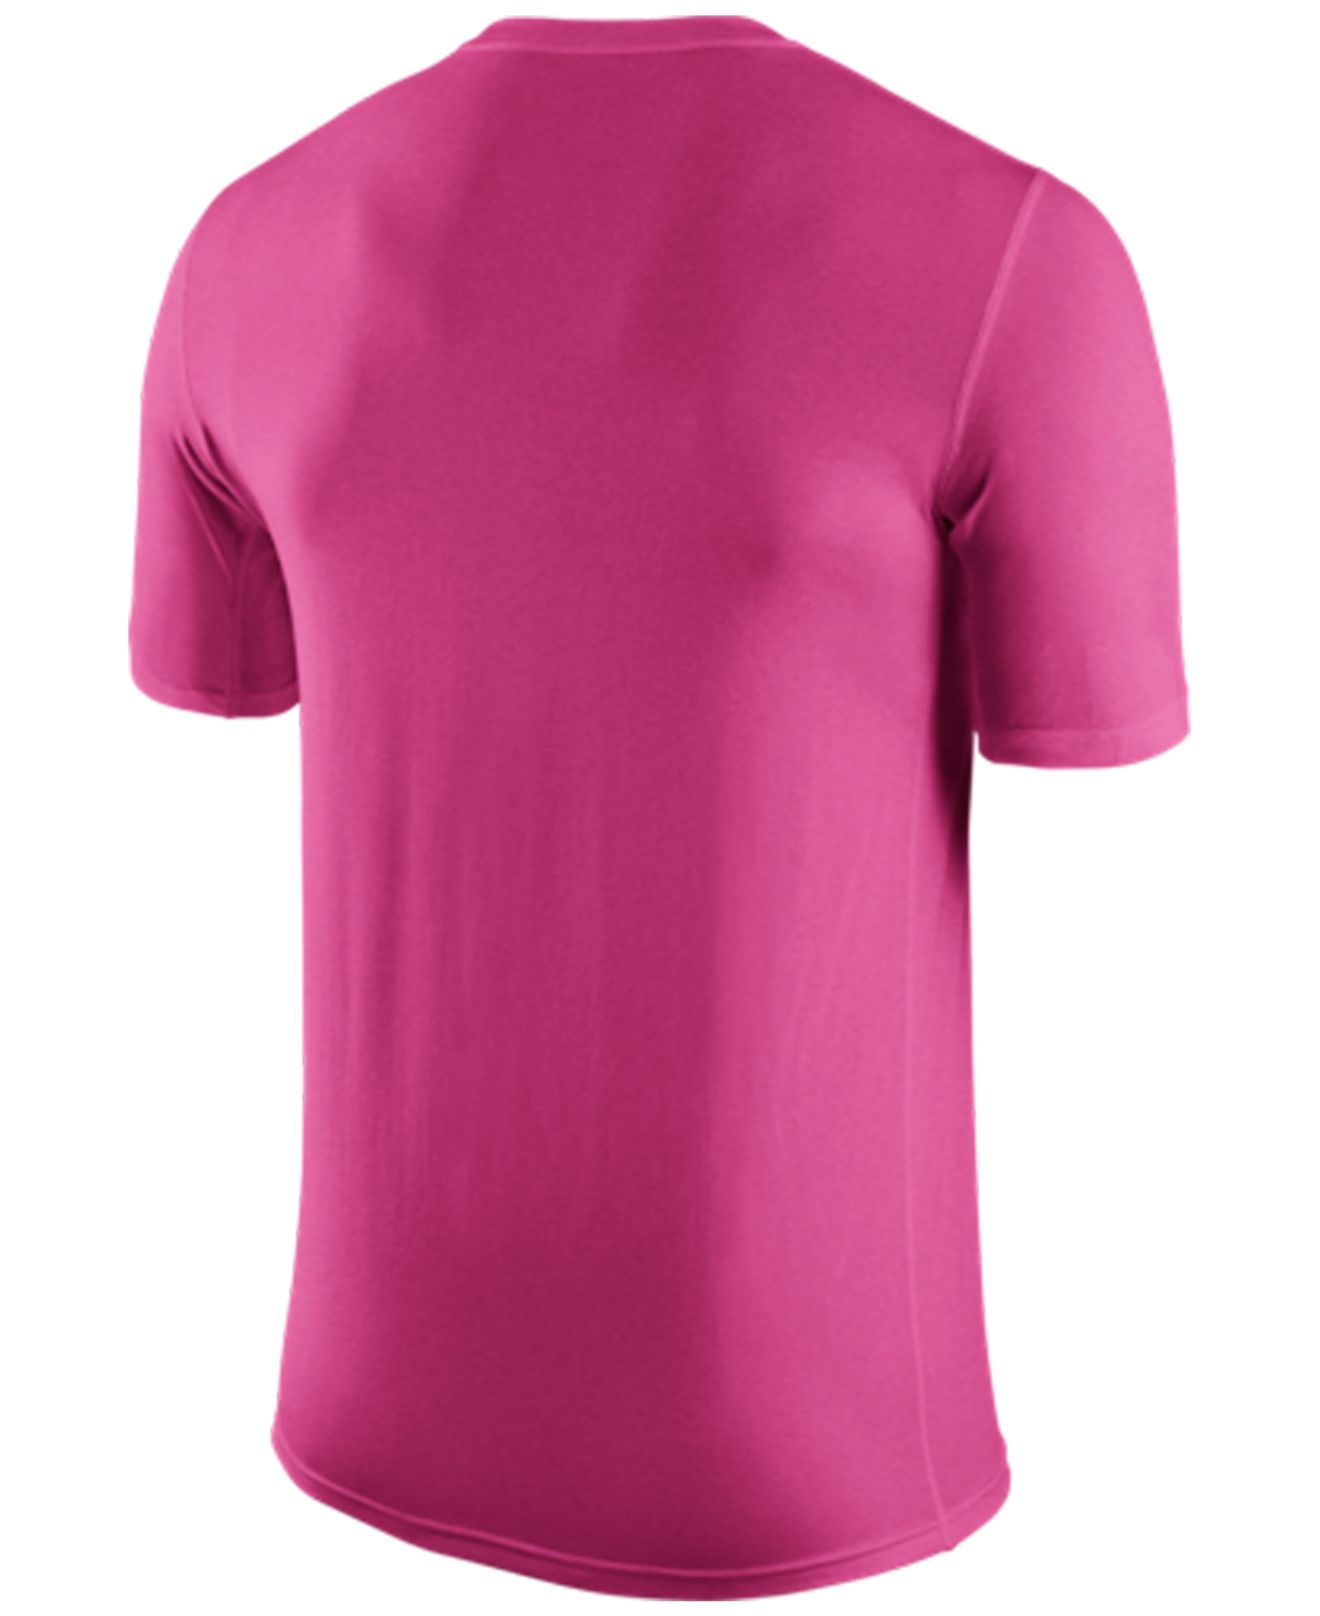 Nike Mens Dri Fit Shirt